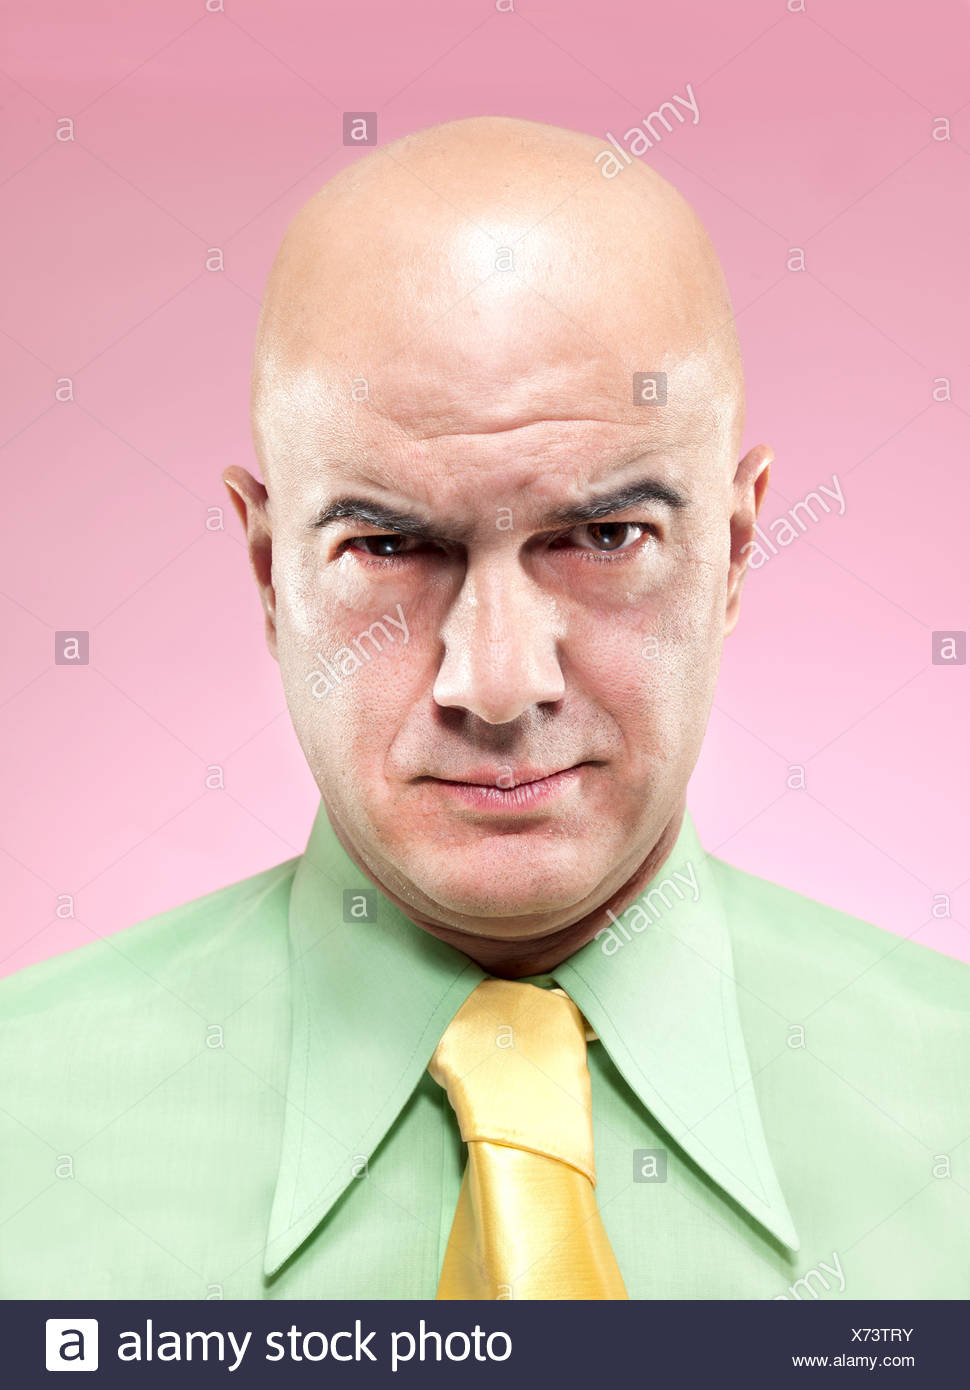 Bald man frowning - Stock Image